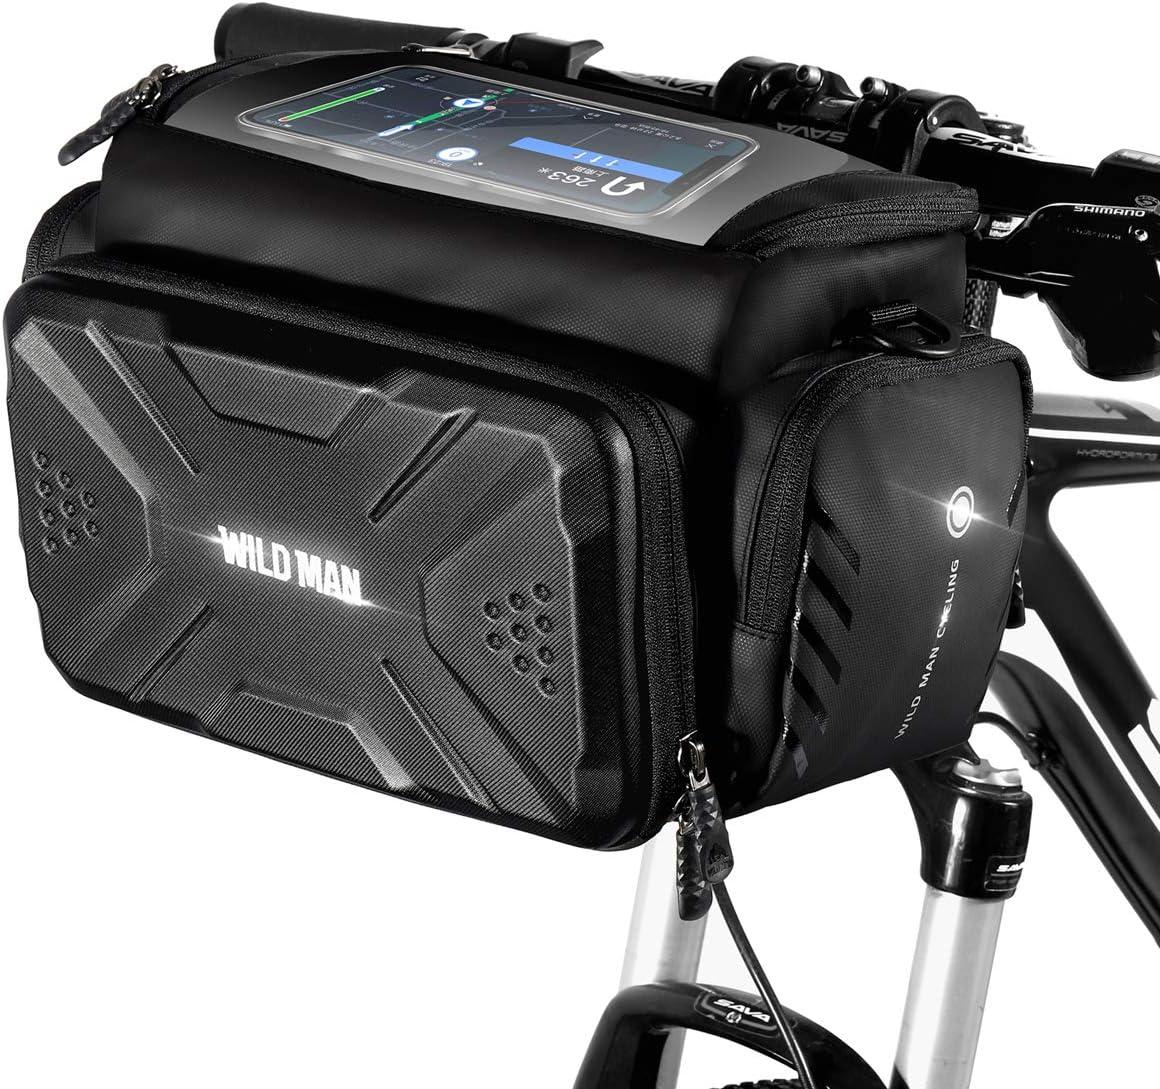 WILD MAN Bicycle Phone Bag MTB Road Bike Handlebar Touch Screen Bag Case